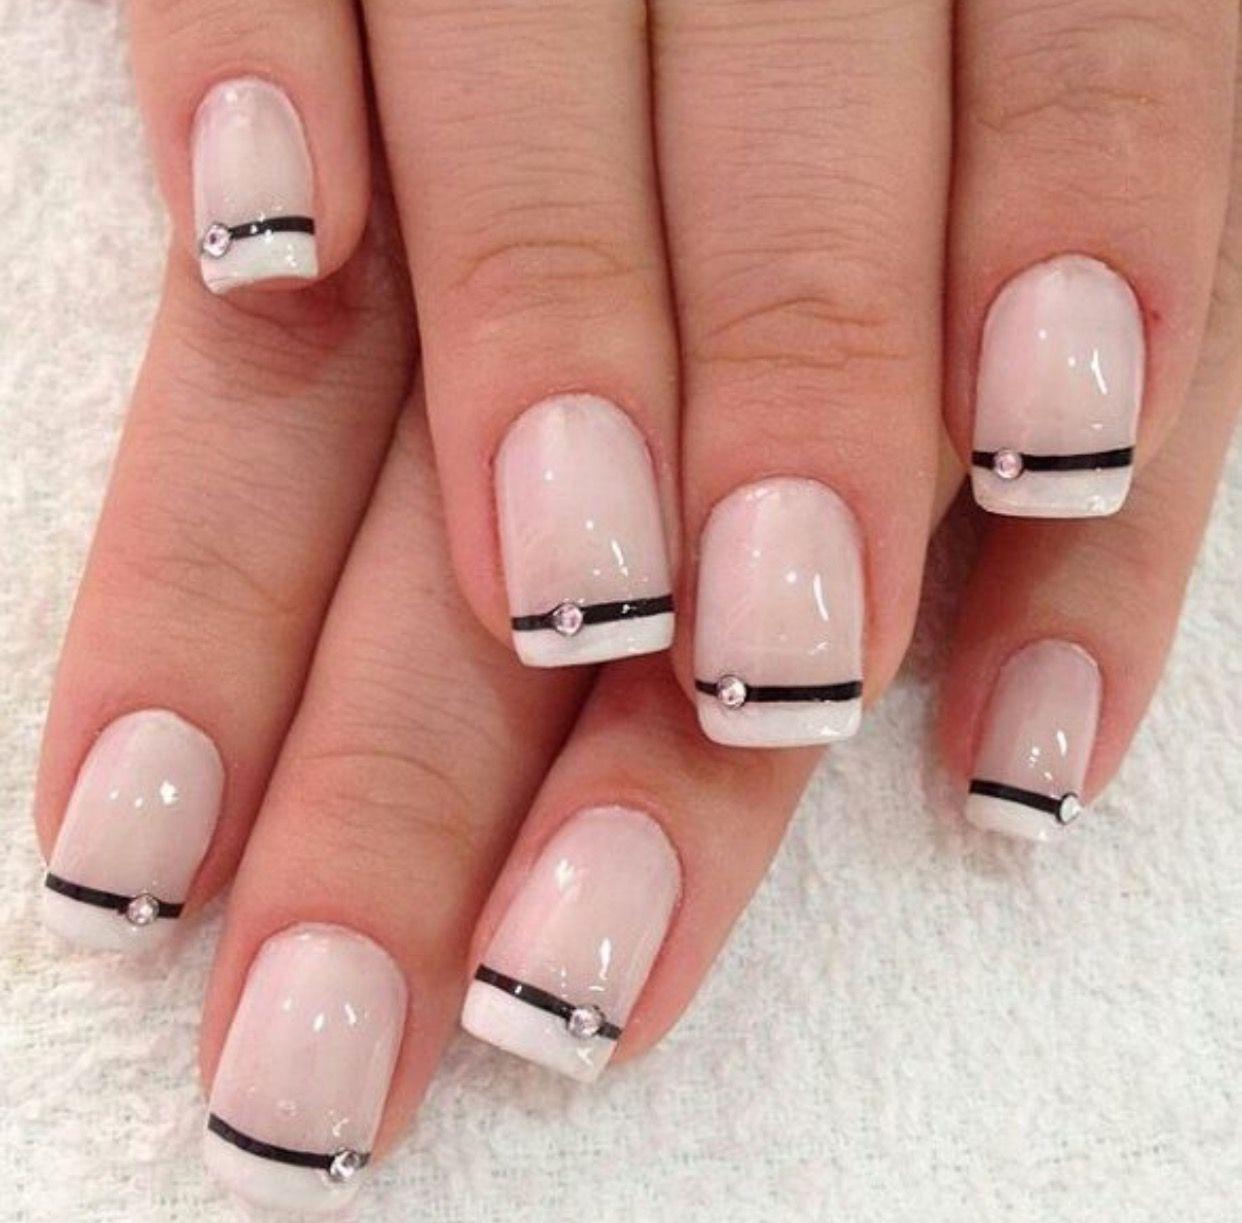 Pin by Rebecca on Nail design | Pinterest | Manicure, Fall nail ...